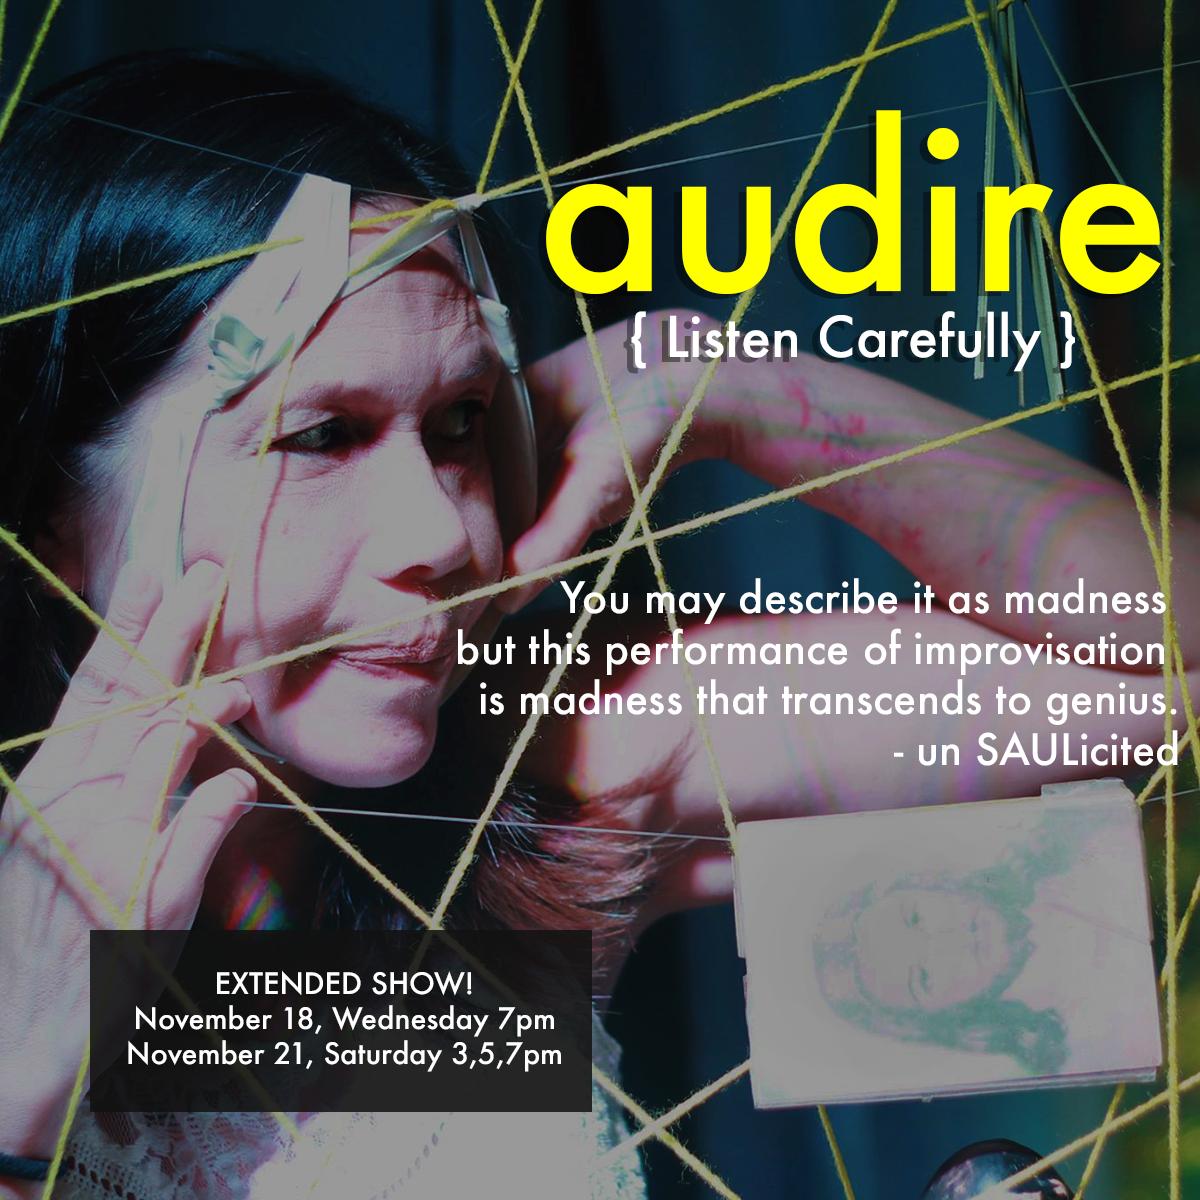 audire-reviews3.png